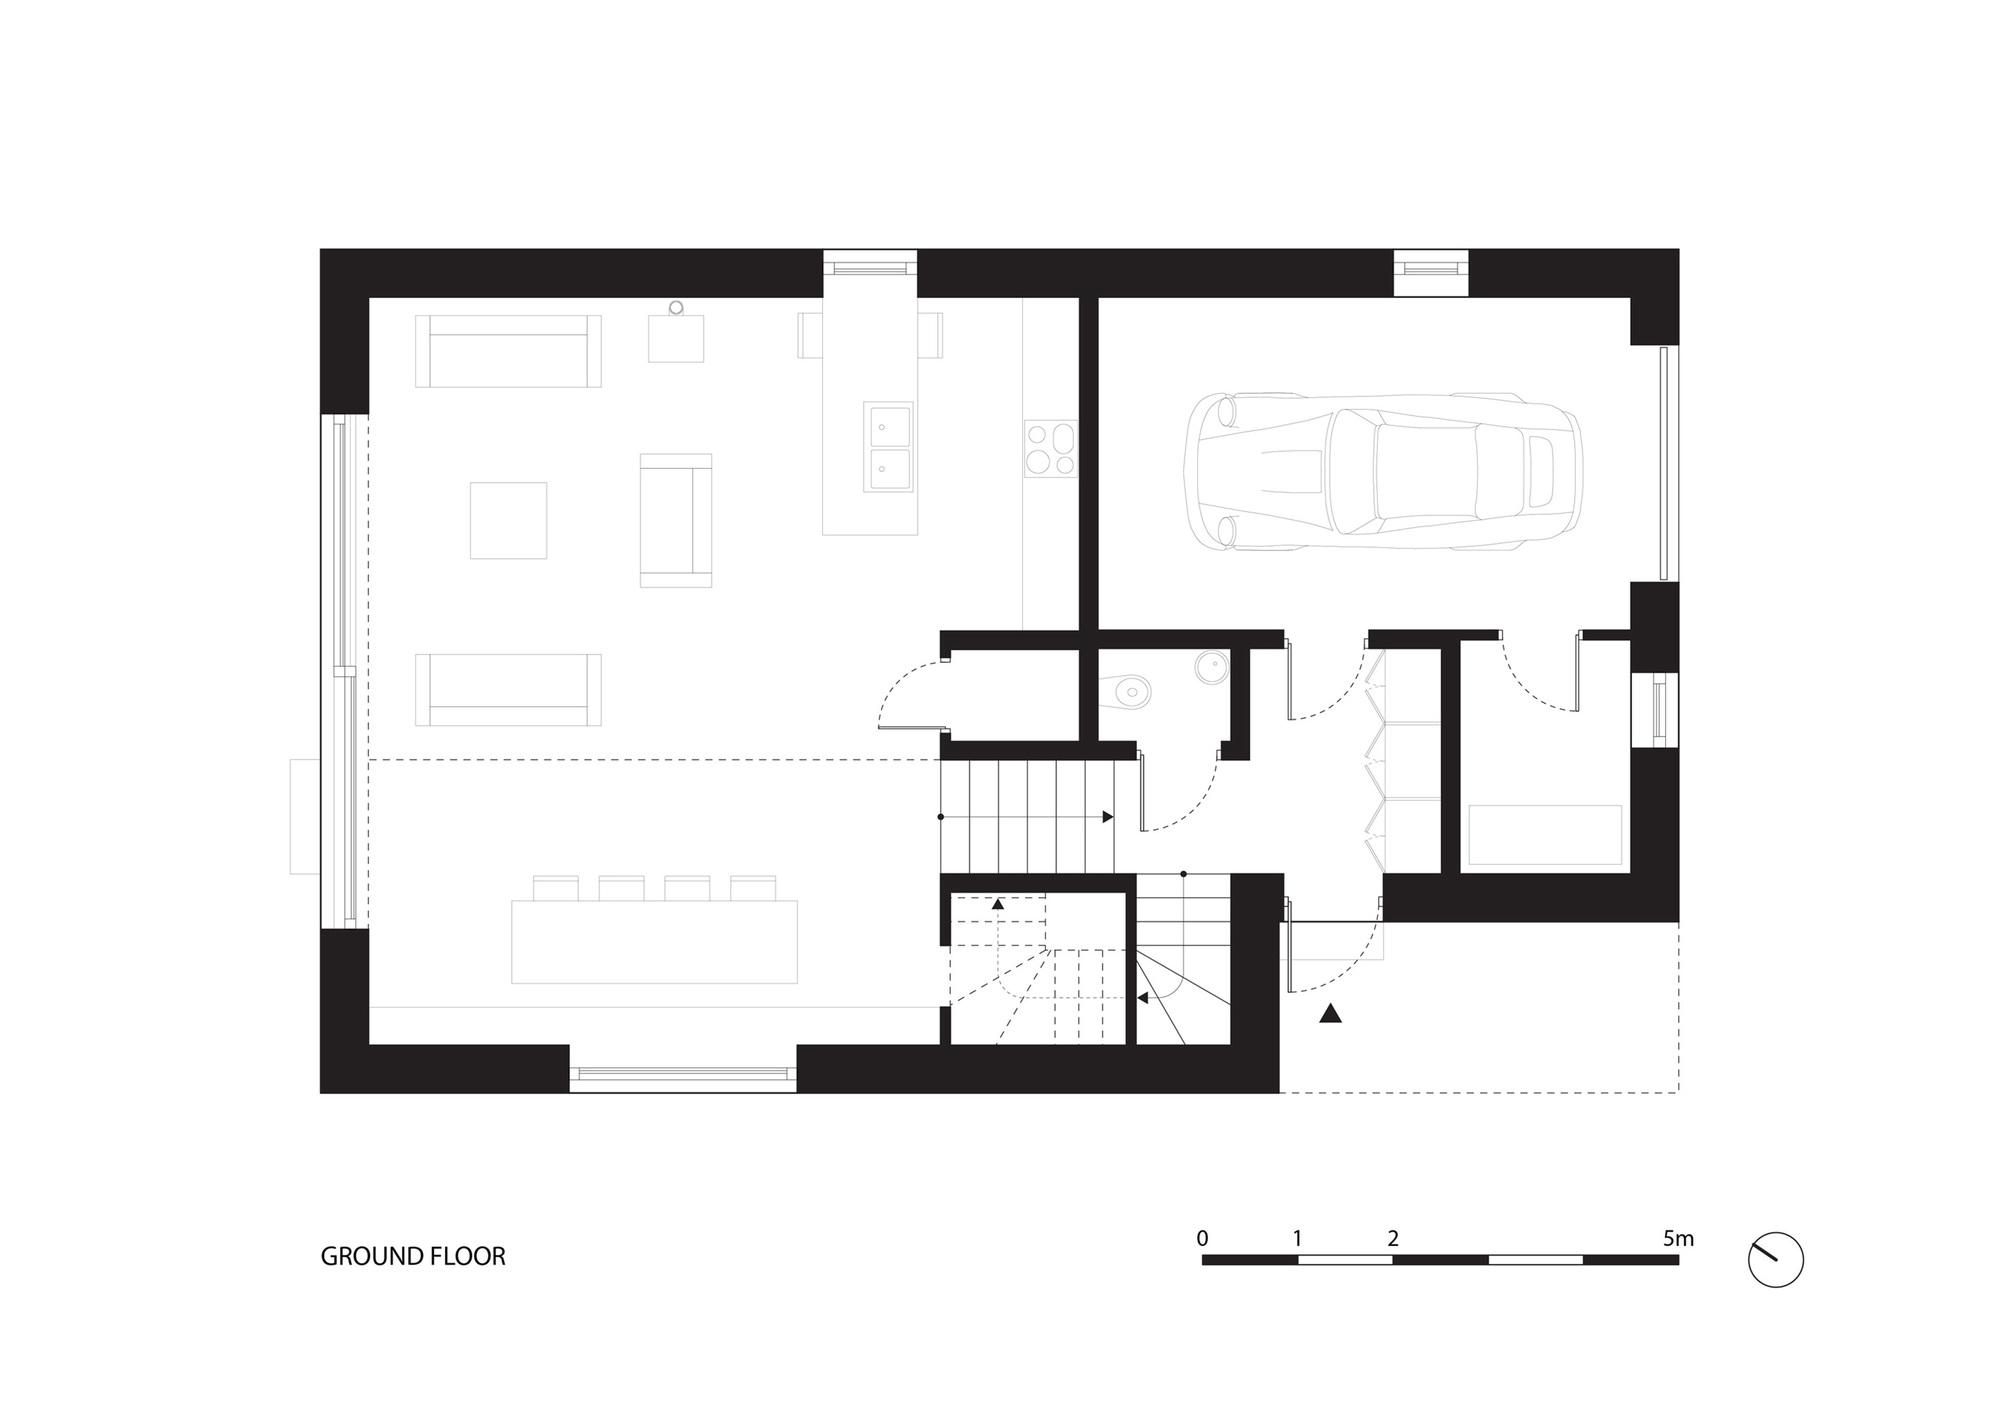 Planos de Casa 34.25° de Bartek Arendt